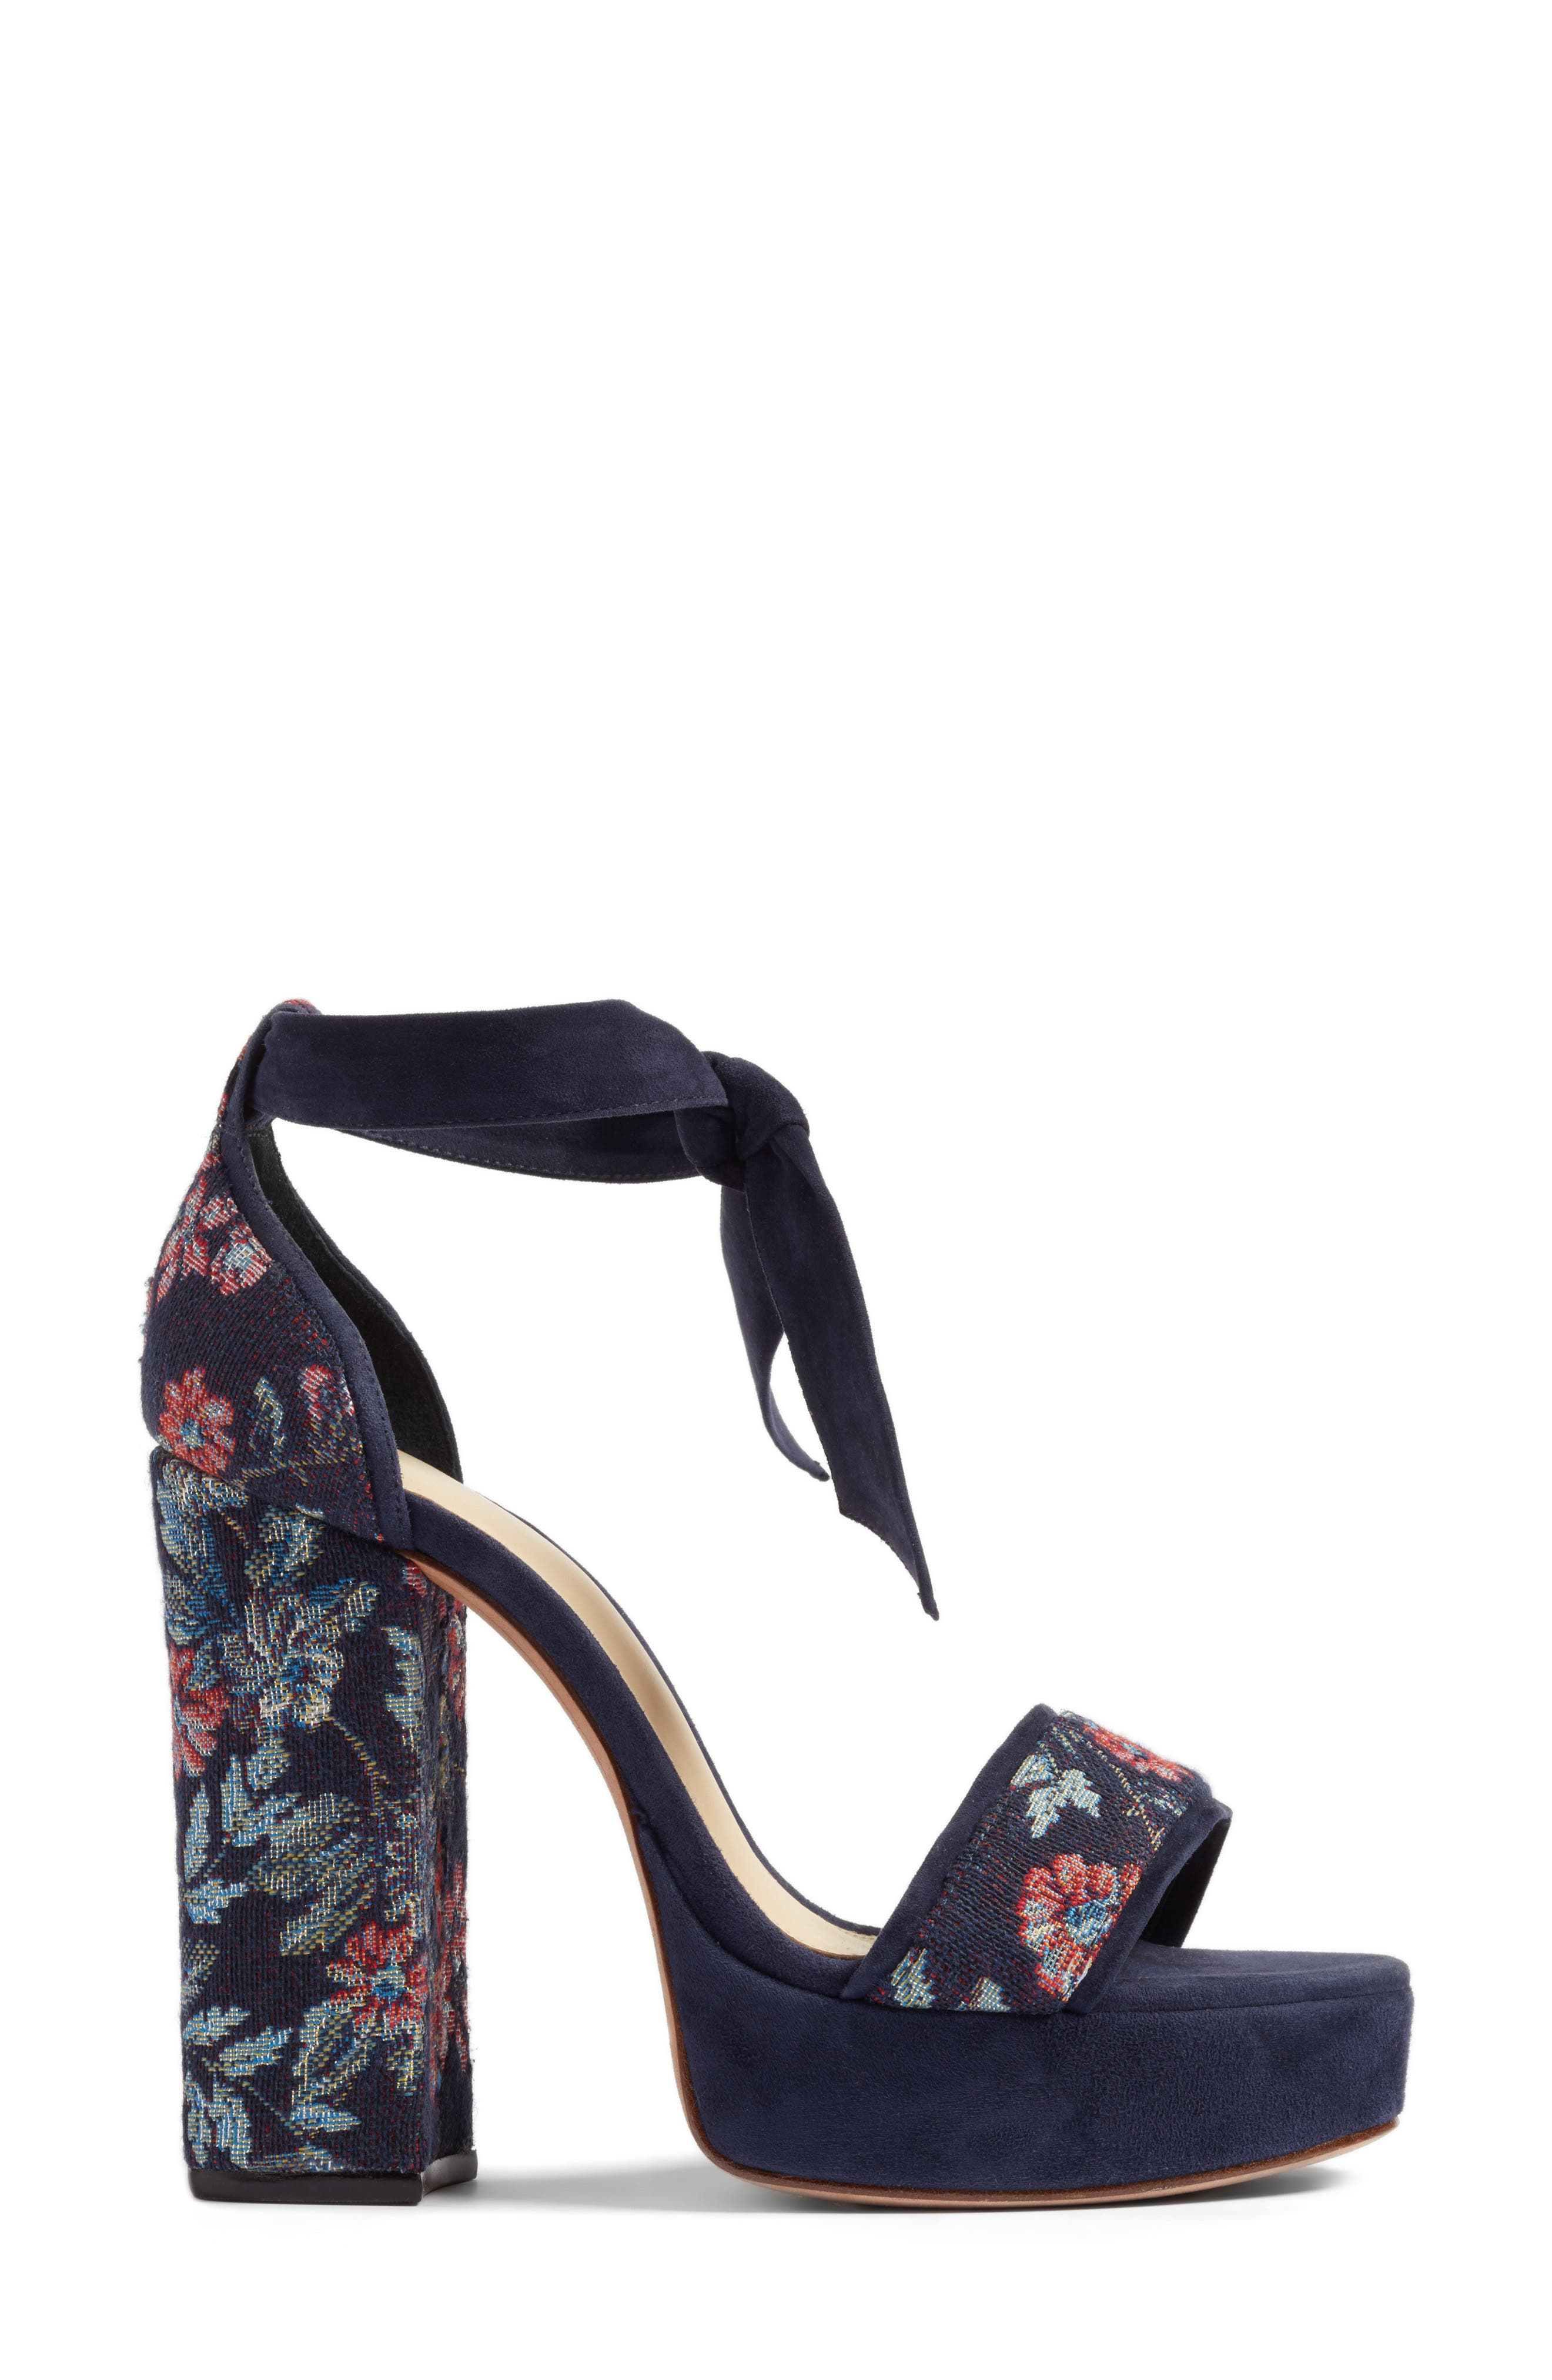 Celine Platform Sandal,                             Alternate thumbnail 5, color,